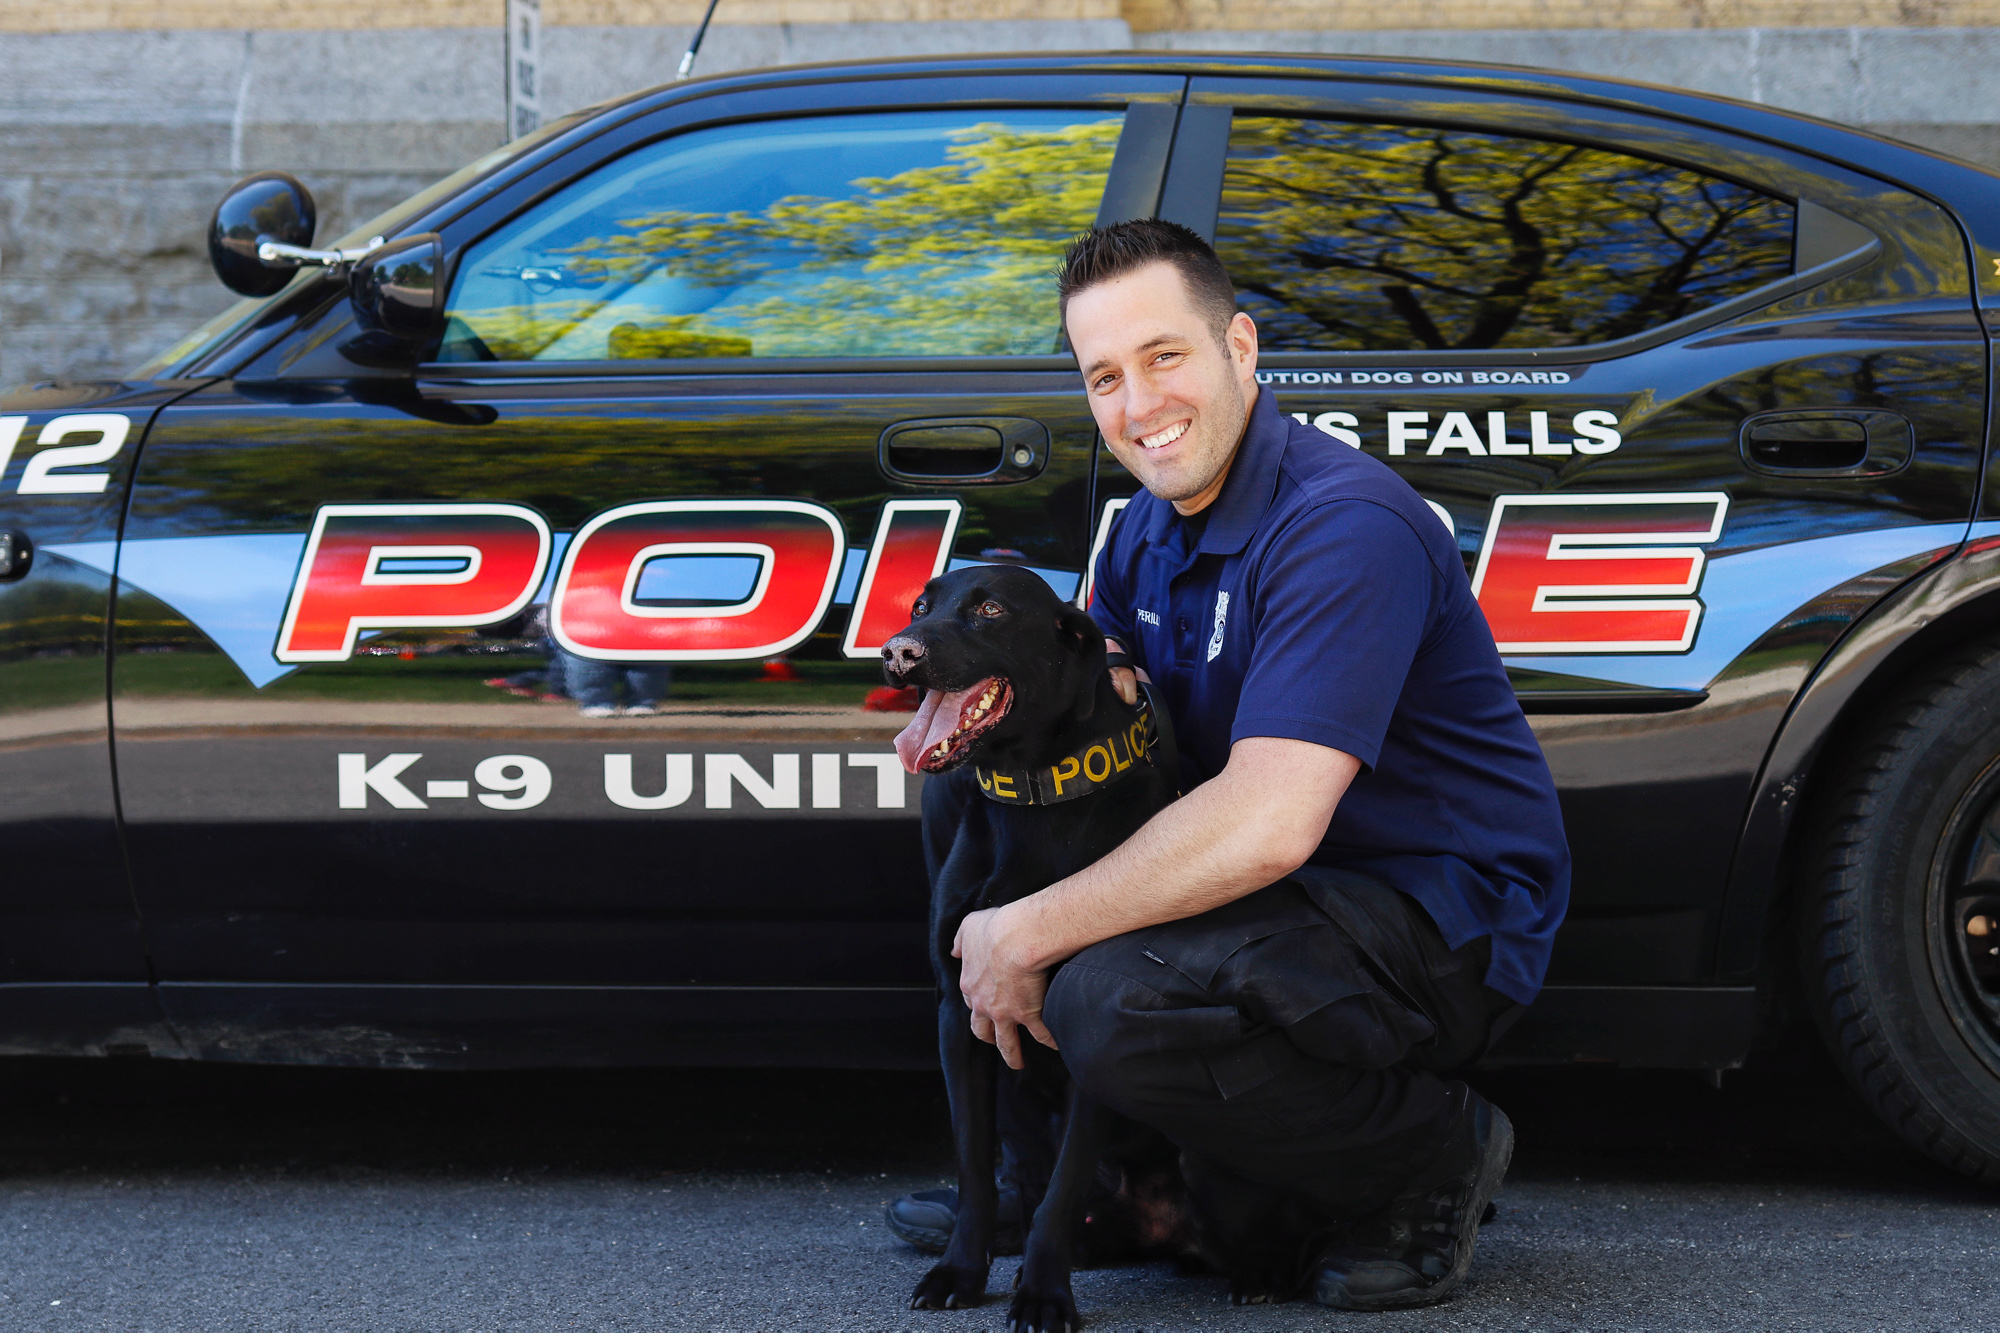 Glens Falls Police Department K-9 Officer